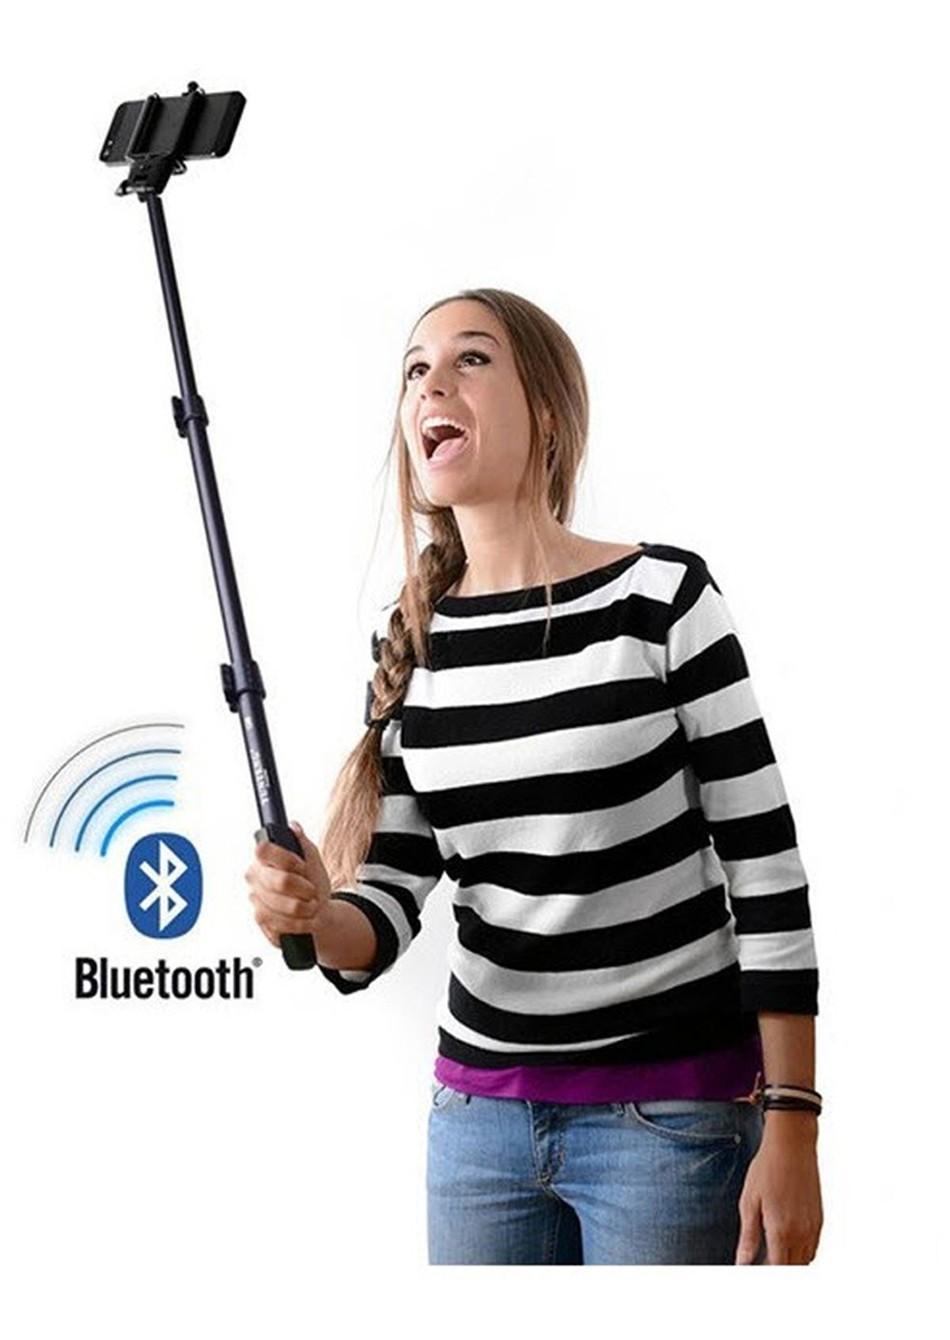 Tripod-4-In-1-Yunteng-1288-Bluetooth-Extendable-Selfie-Stick-Handheld-Yt-1288-Monopod-for-Xiaomi